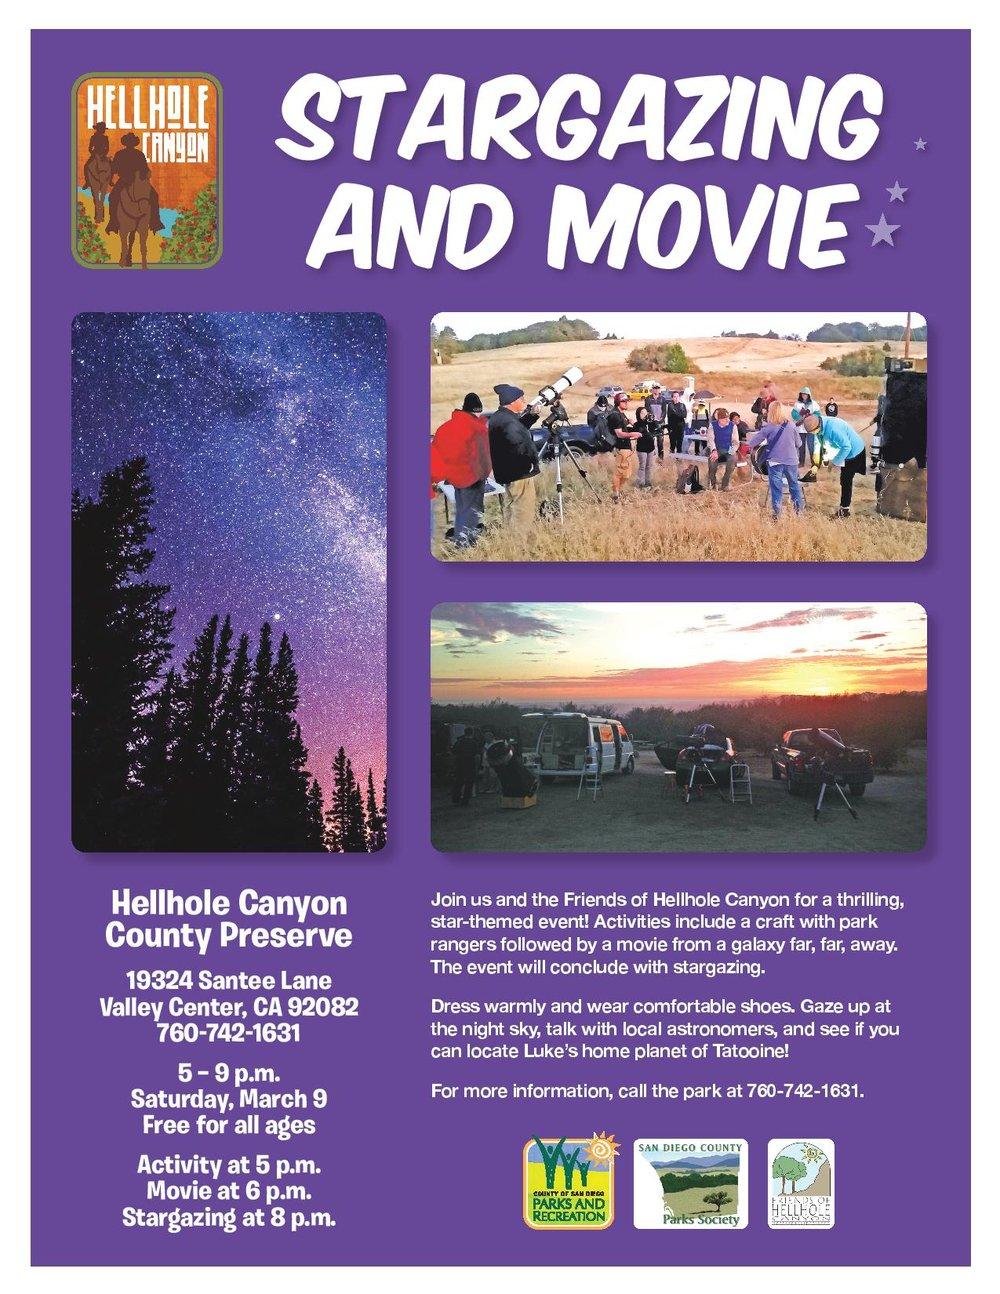 Hellhole Canyon_Stargazing_Movie_Flyer-page-001.jpg